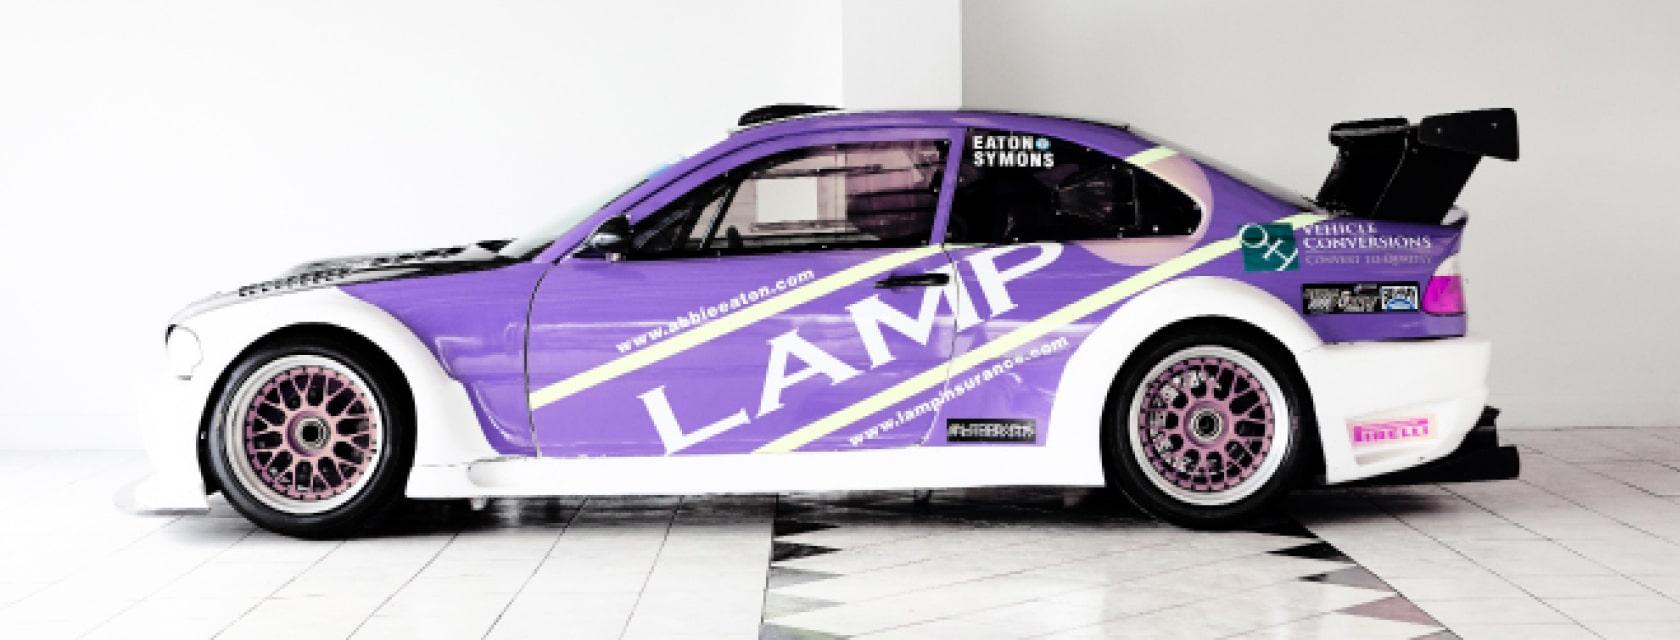 Bmw E46 M3 Gtr For Sale At Geoff Steel Racing Racing Car